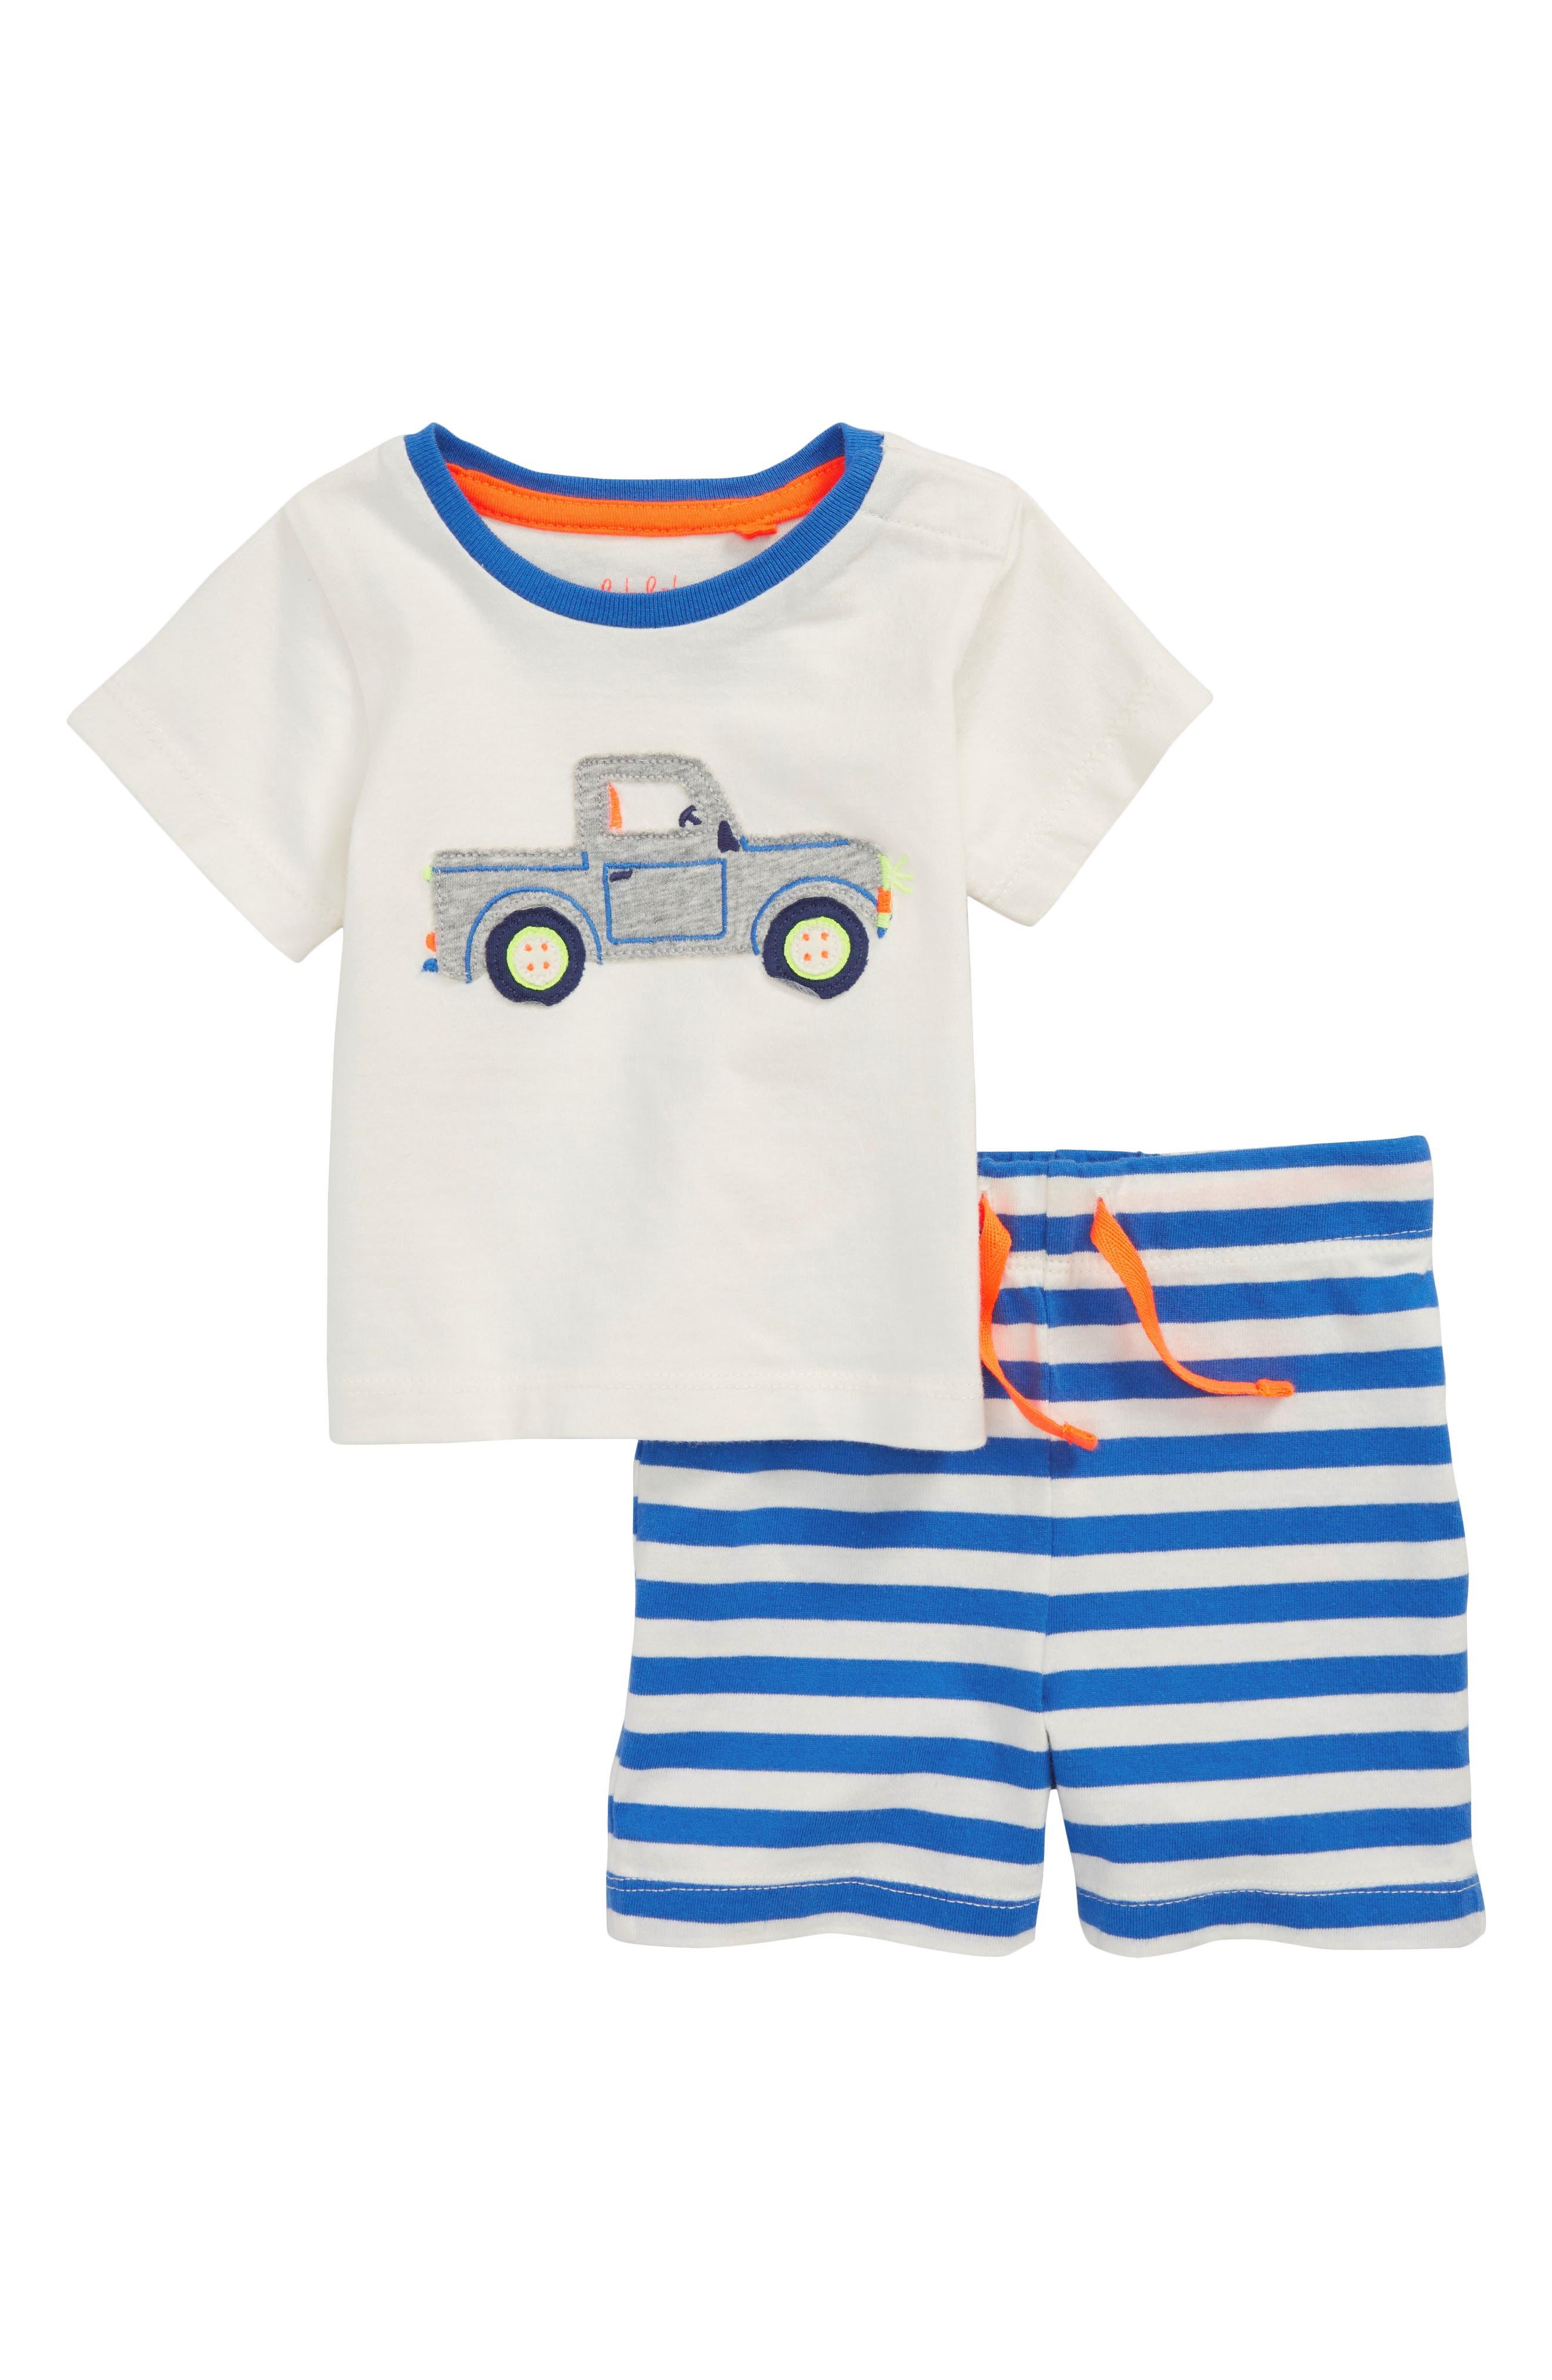 Fun Truck Appliqué T-Shirt & Shorts Set,                             Main thumbnail 1, color,                             Ivory Truck